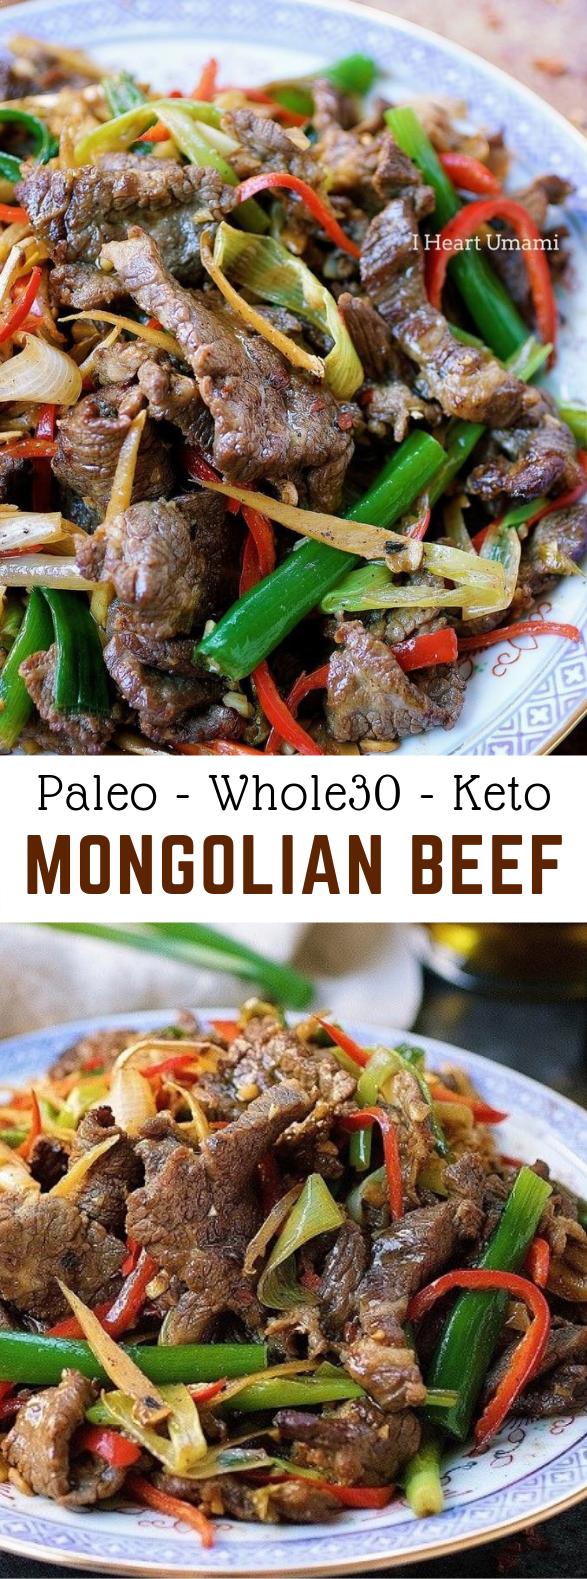 Paleo Mongolian Beef #Paleo #Keto